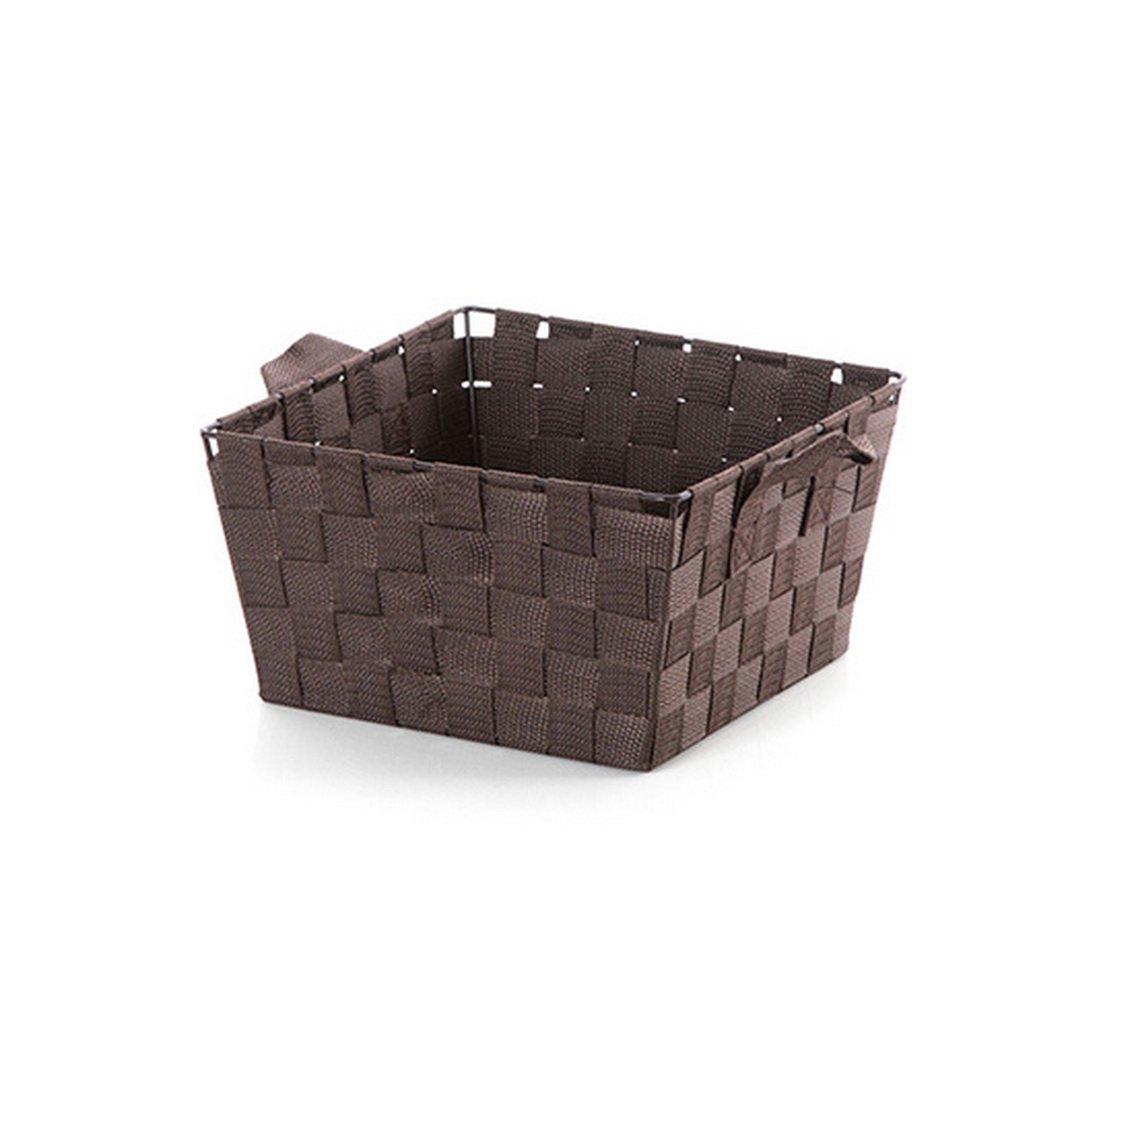 fengg2030shann Cloth weaving storage baskets bathroom kitchen table storage basket storage rectangular box basket weaving basket Baskets storage baskets storage baskets woven baskets